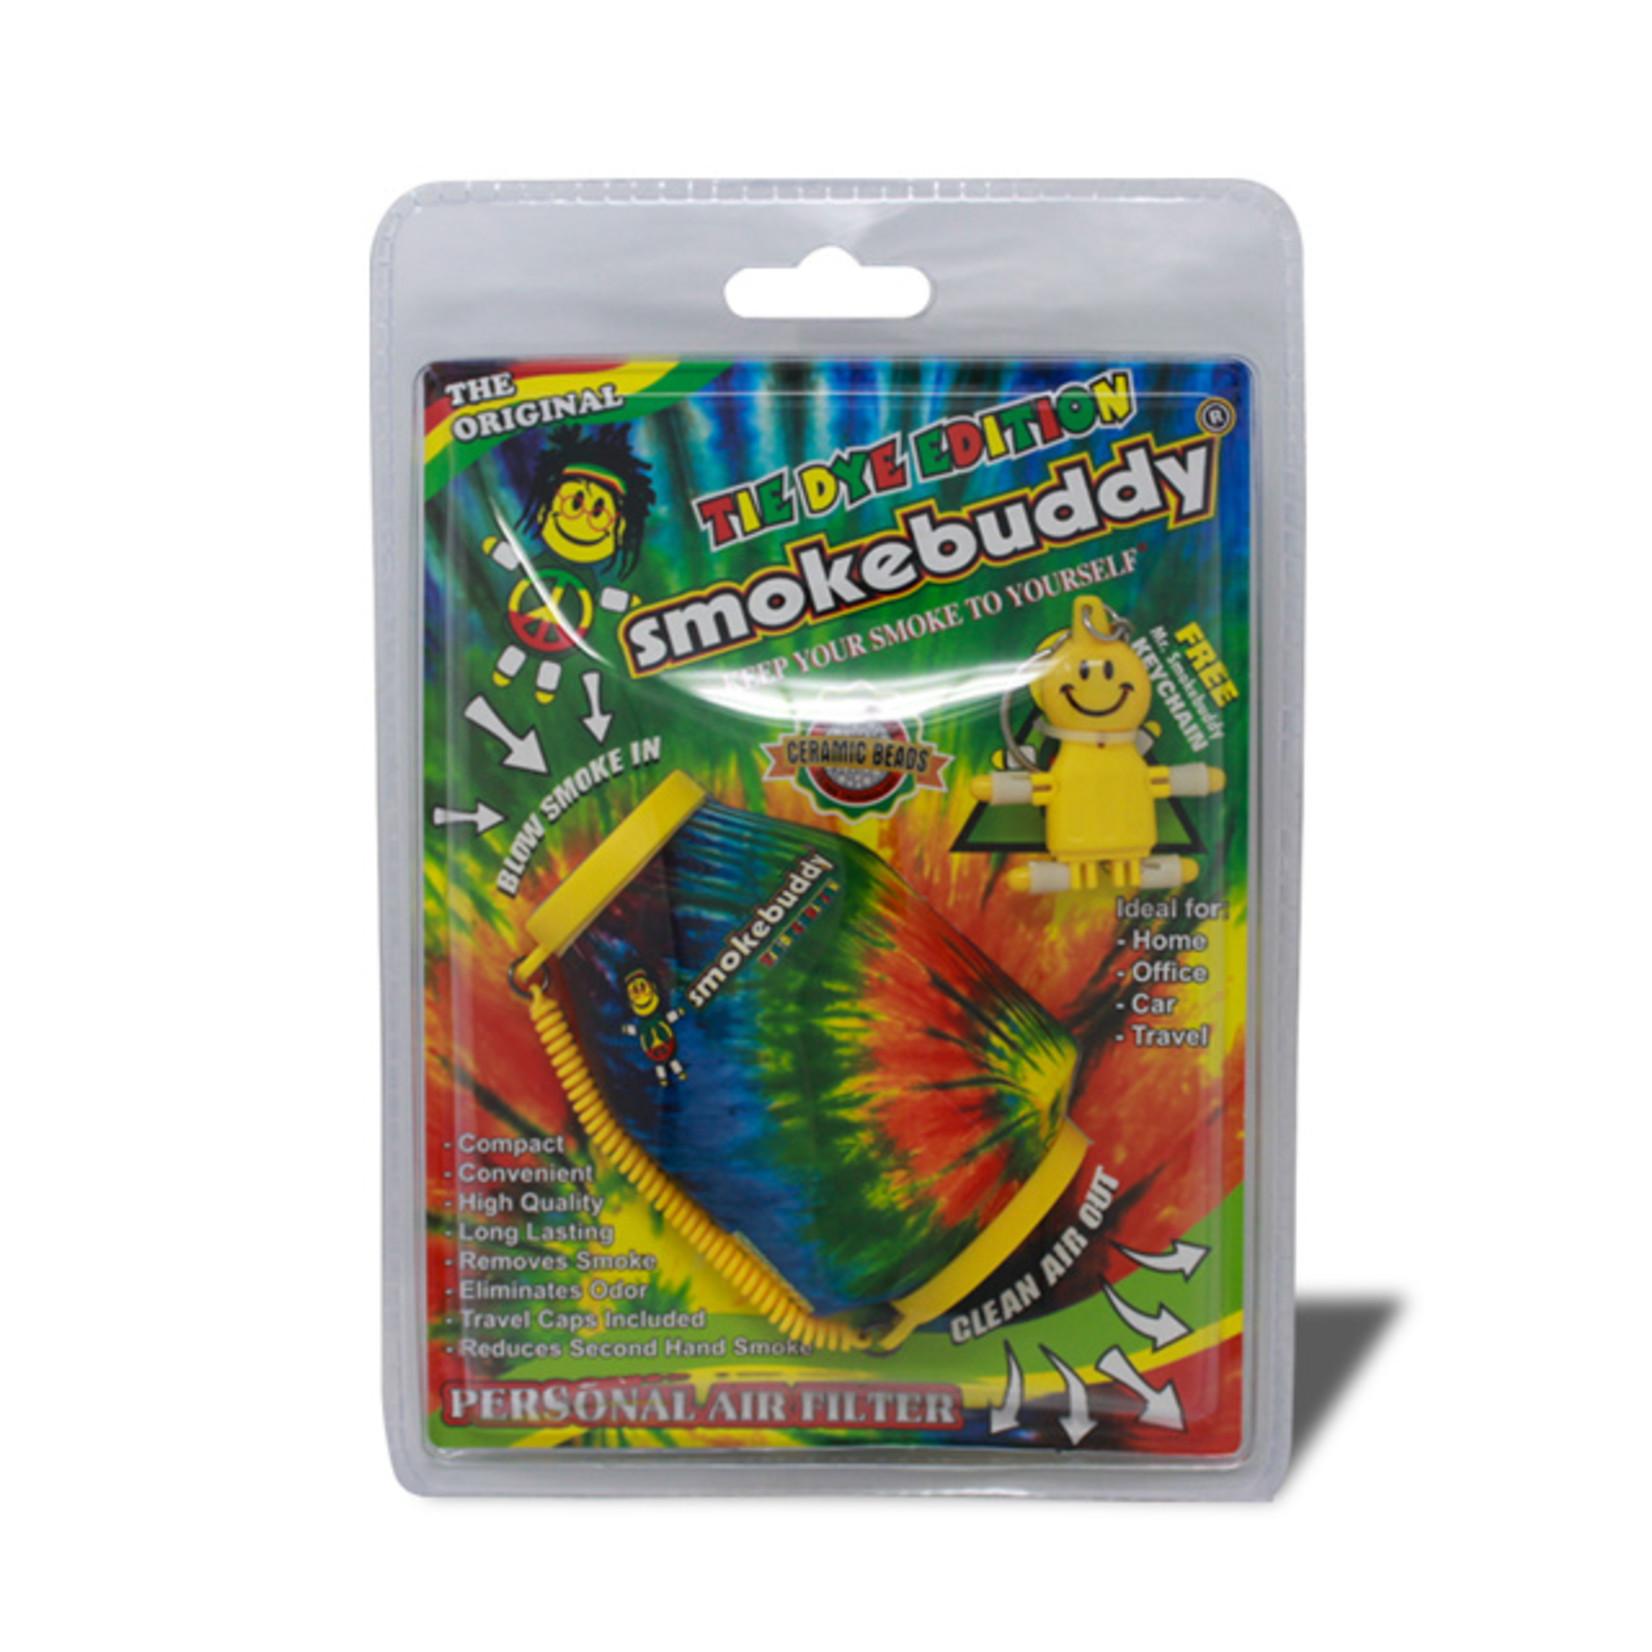 Smoke buddy Personal Air Filter REGULAR Size